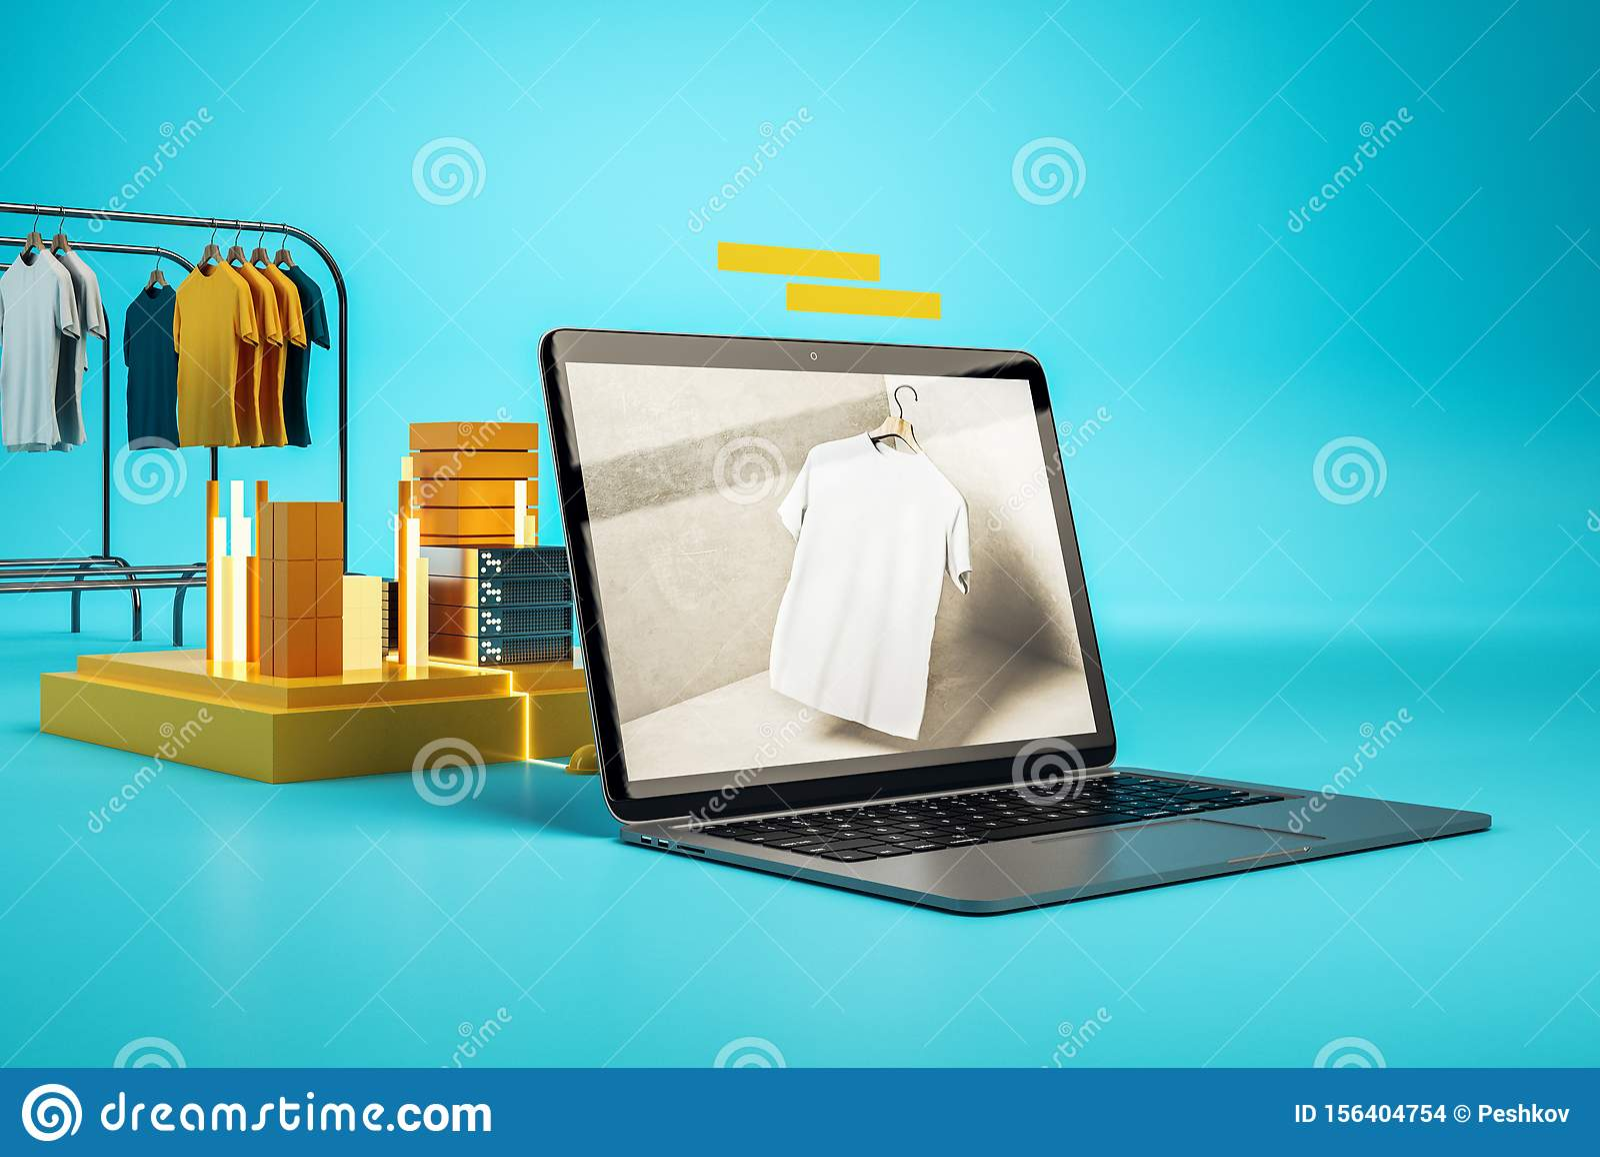 Creative online shopping concept